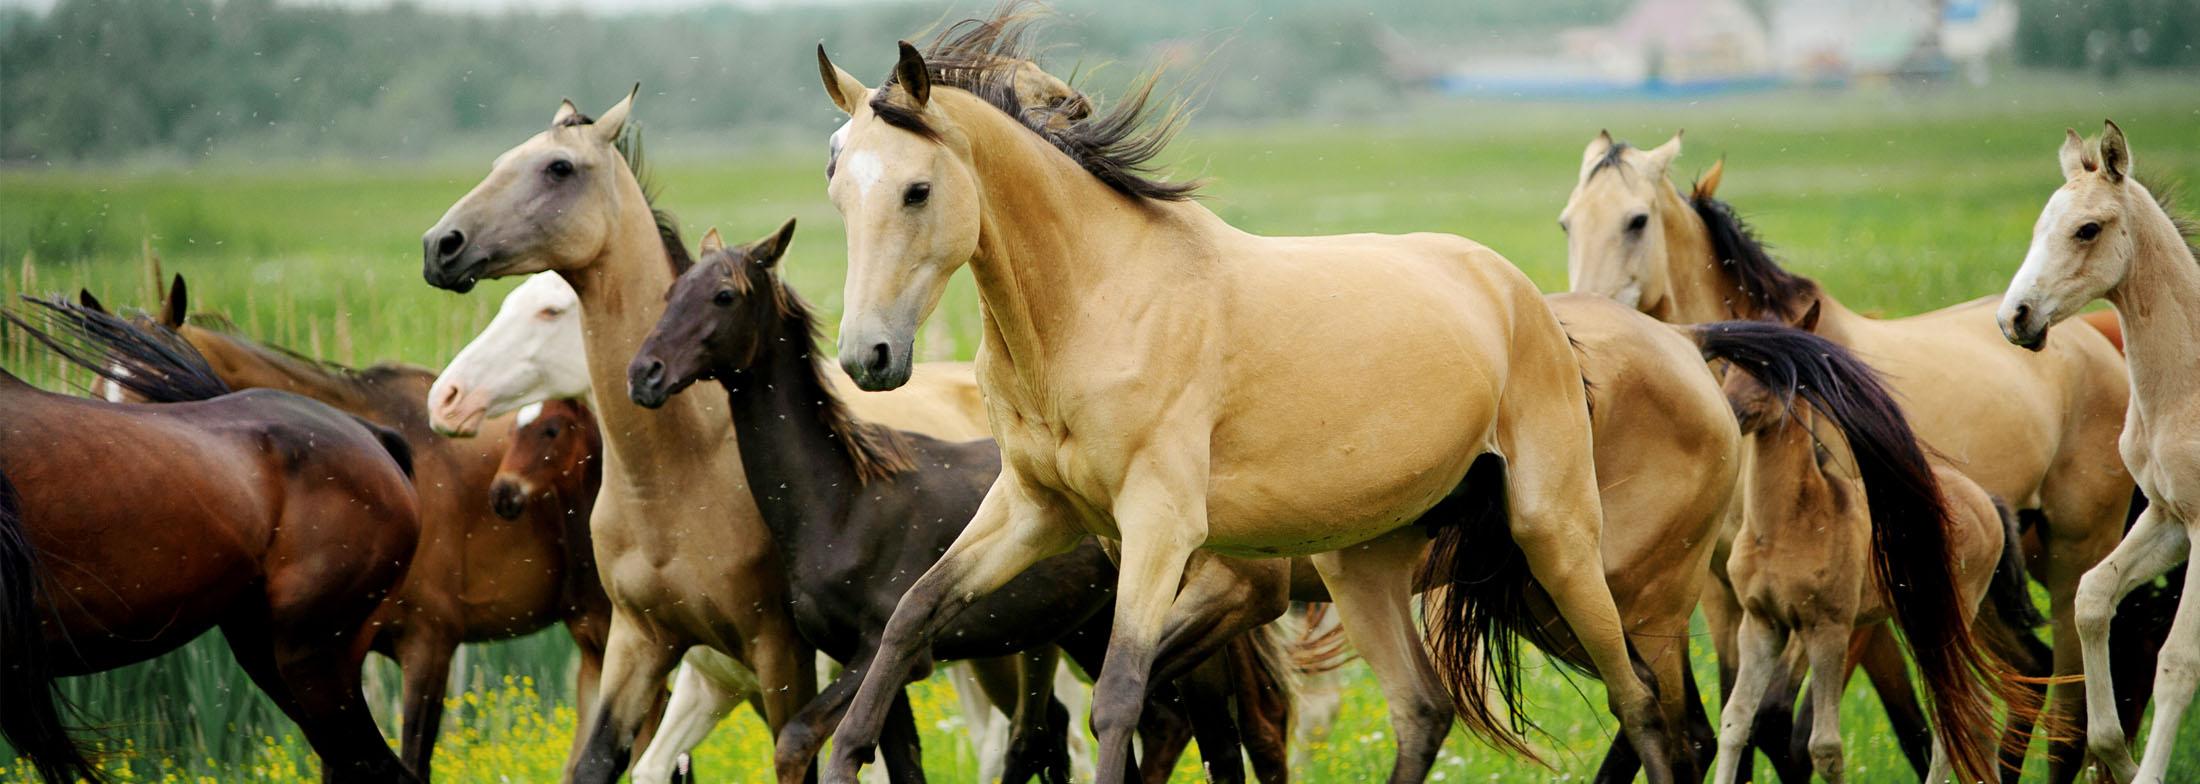 equineslider1